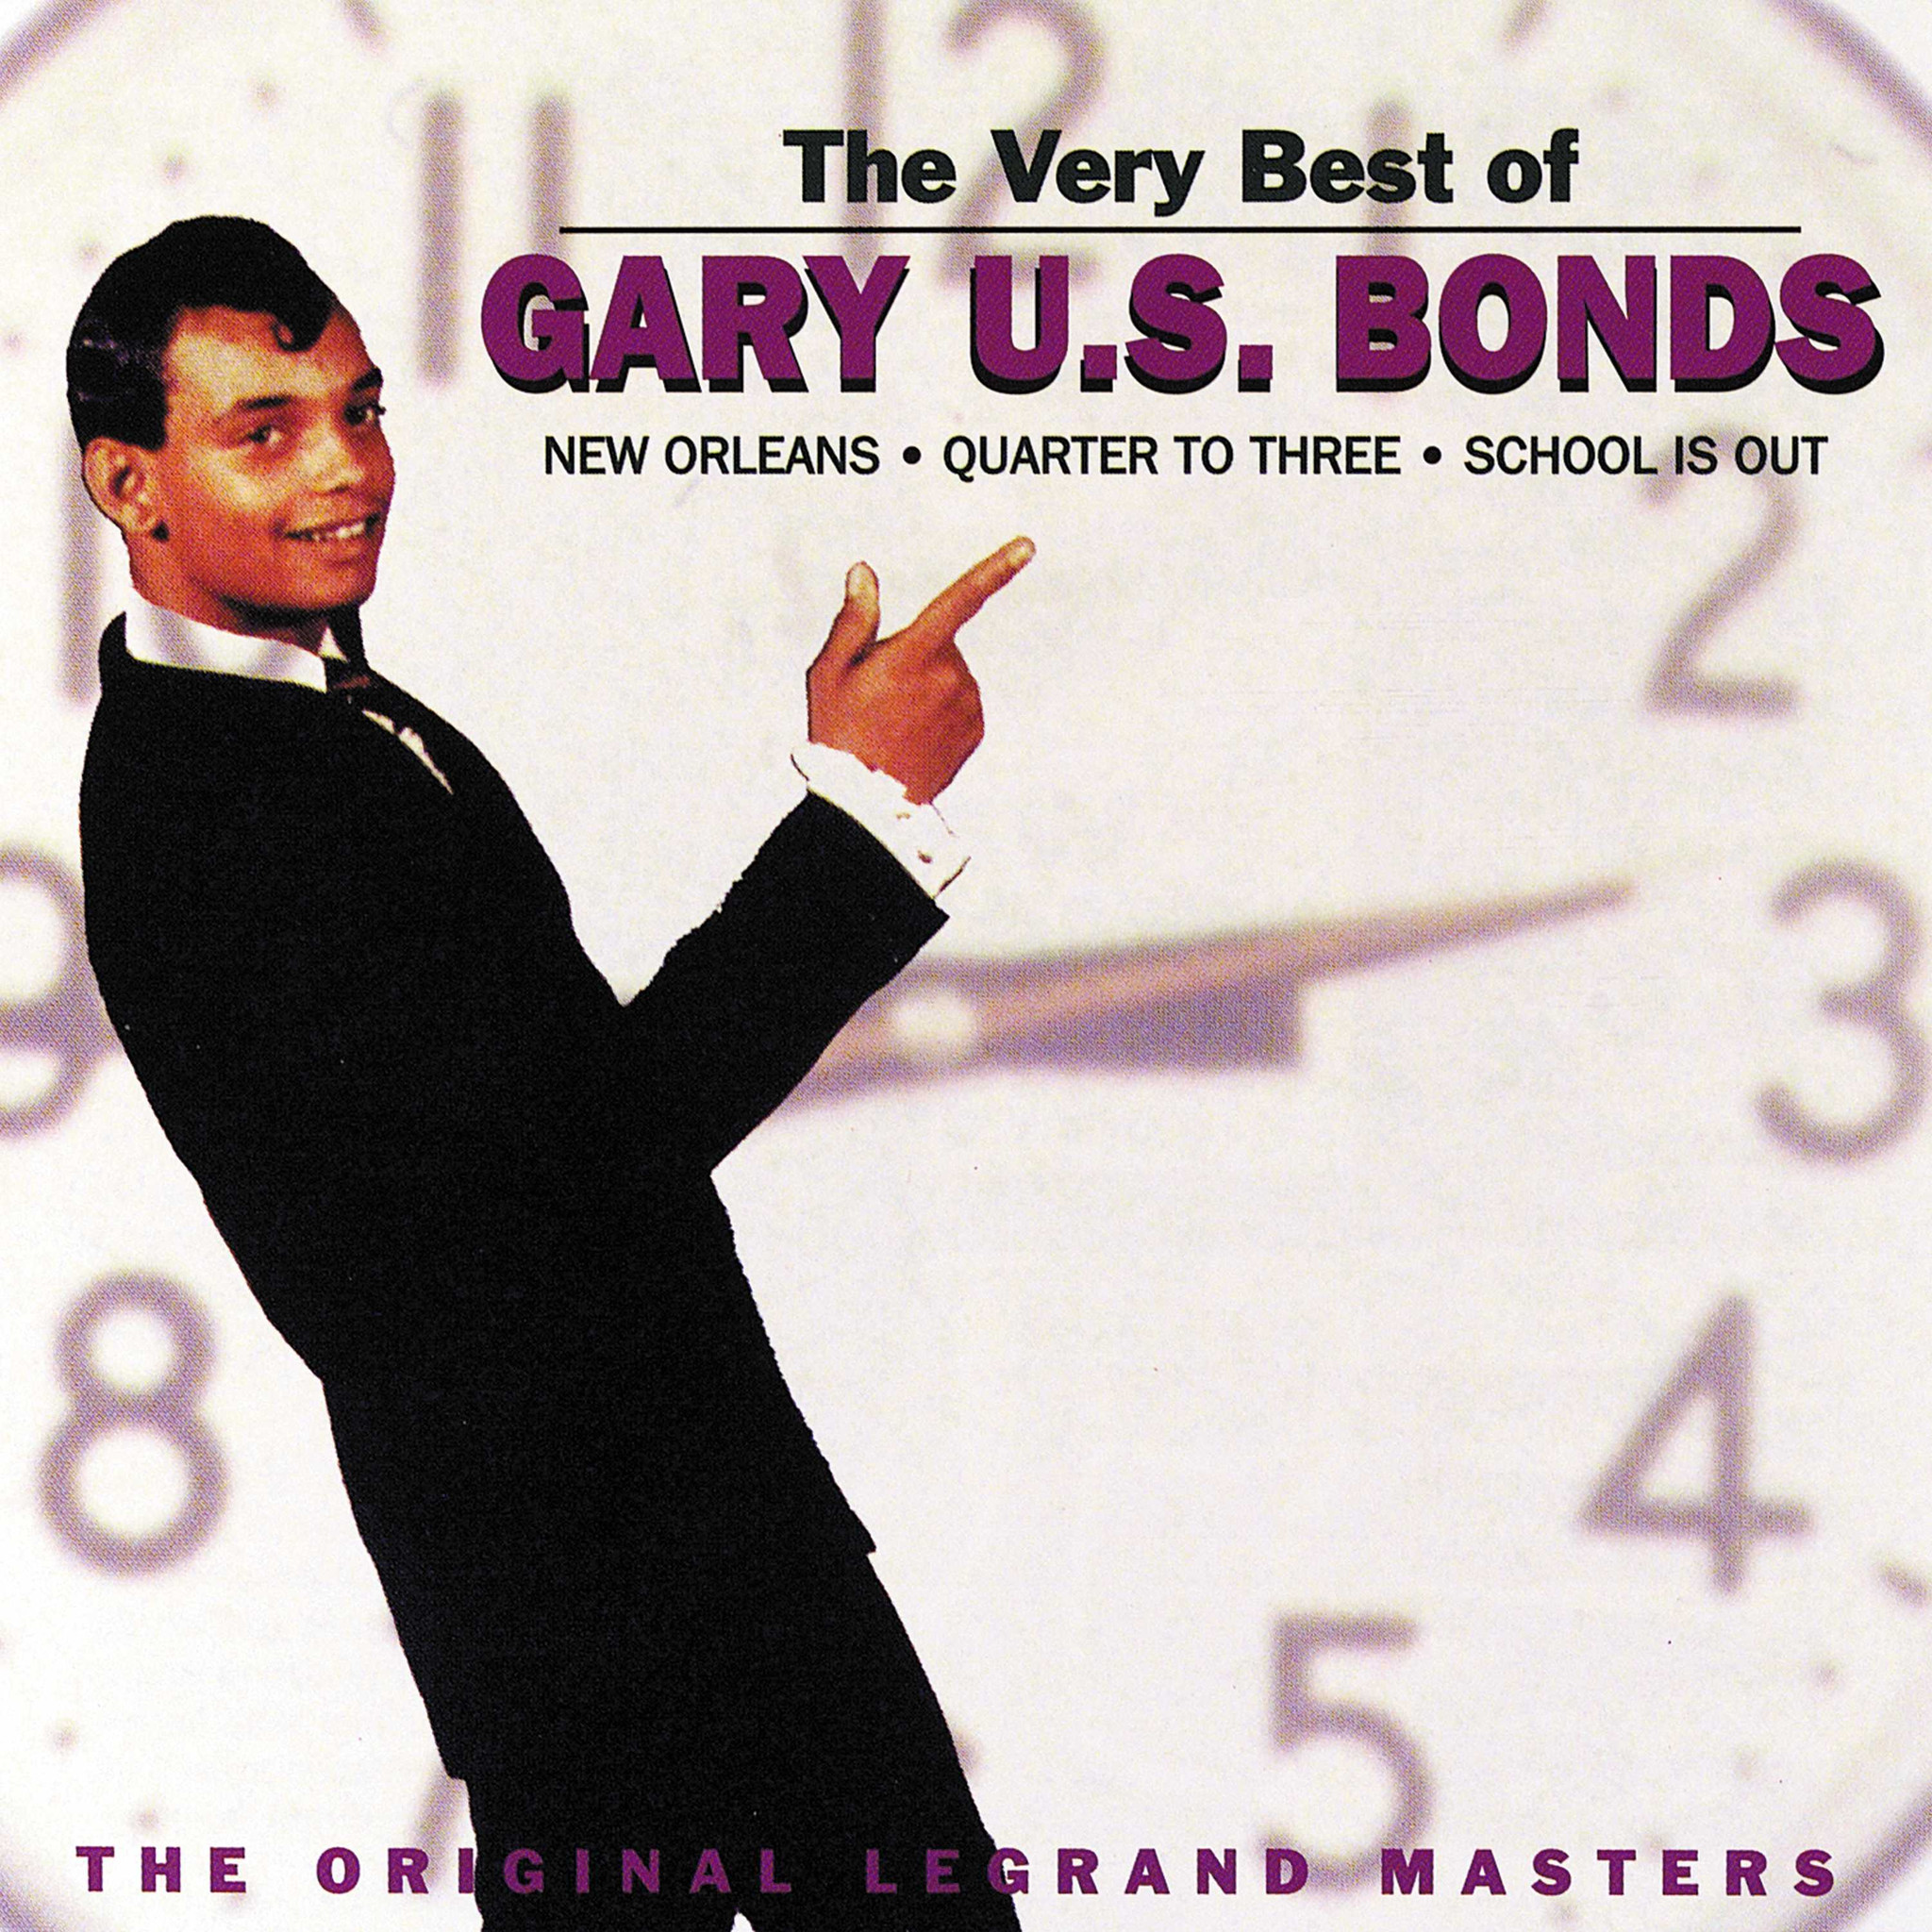 Very Best Of - Gary U.S. Bonds - Musik - VARESE SARABANDE - 0030206593822 - August 11, 1998